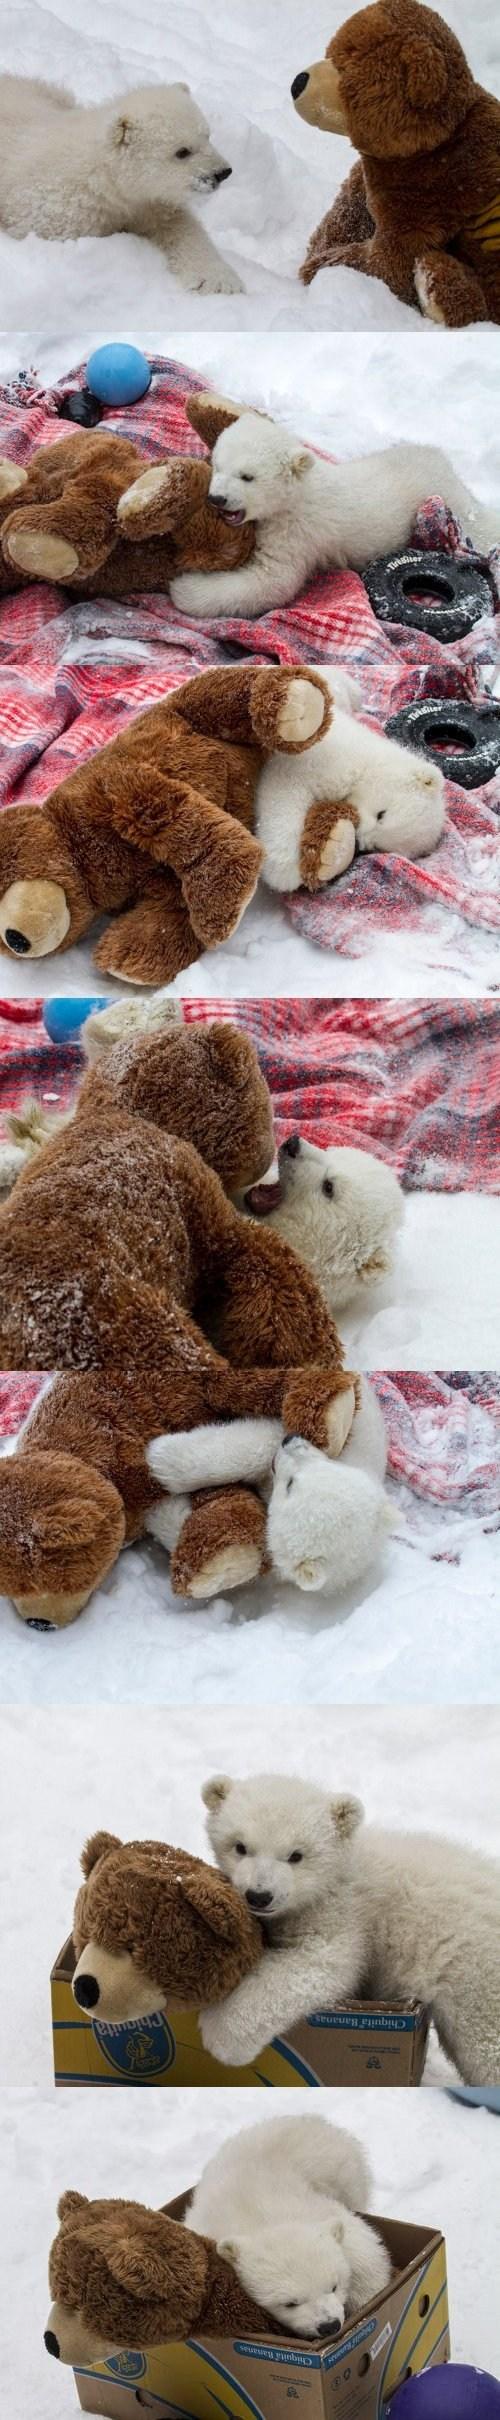 teddy bear polar bear attack - 7267425024